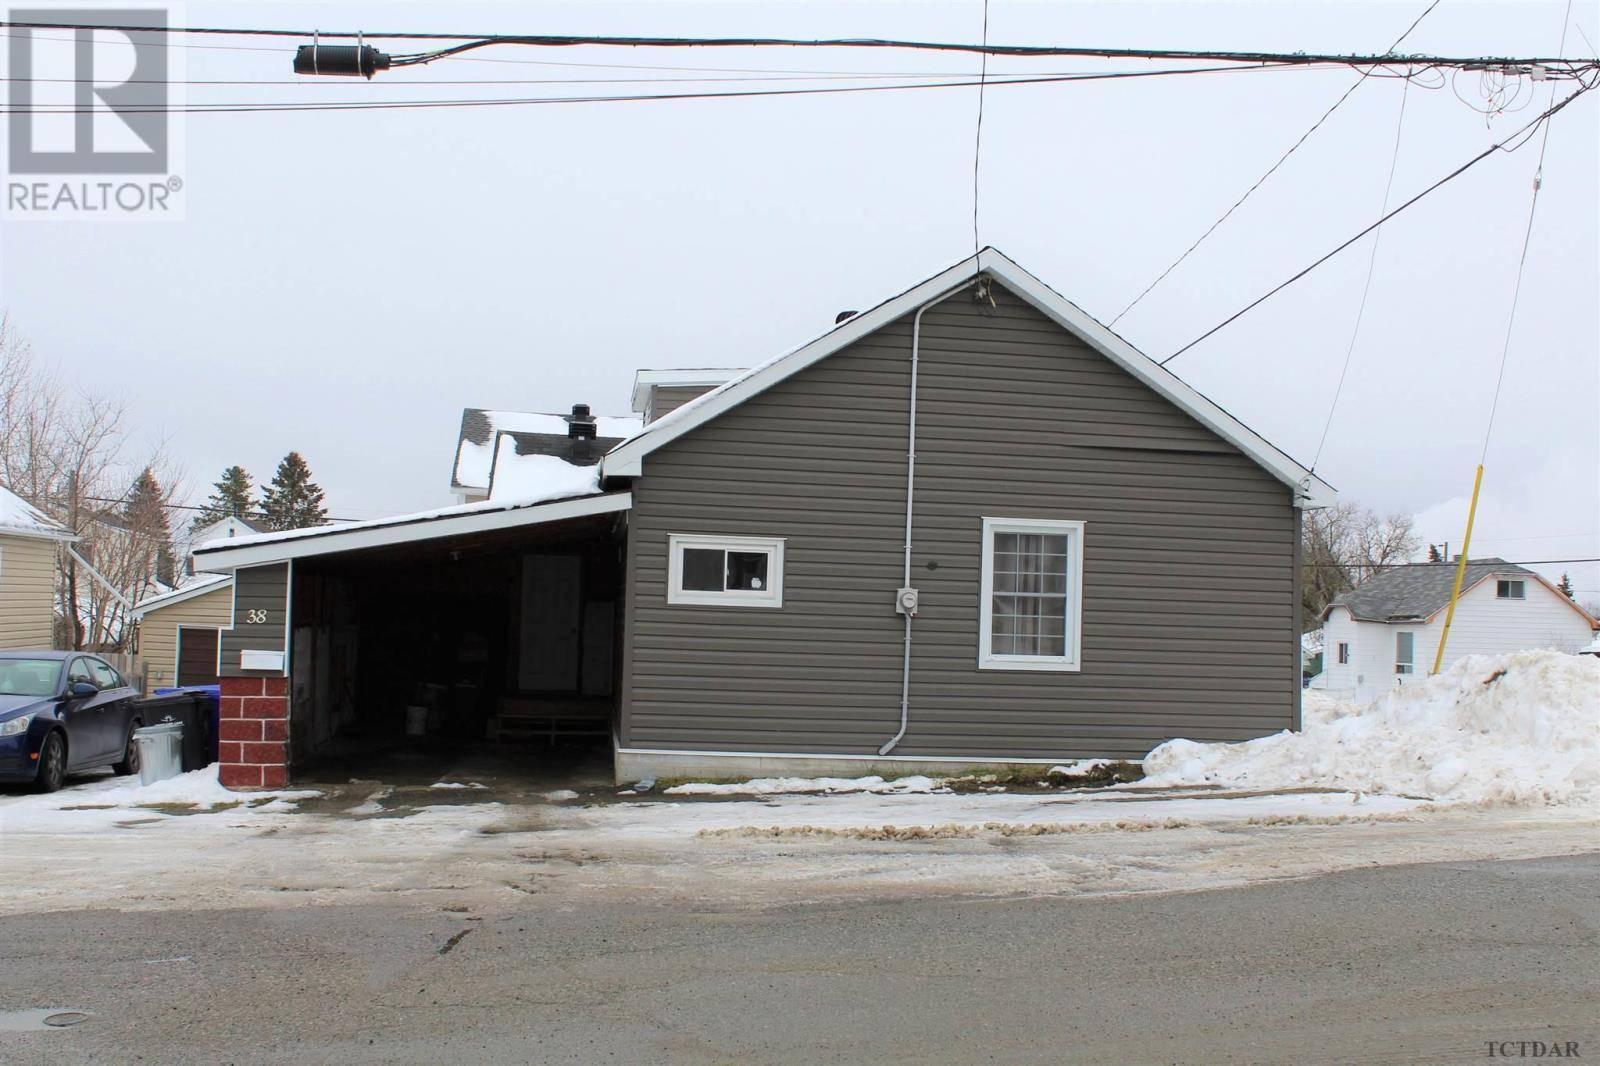 House for sale at 38 Mccamus Ave Kirkland Lake Ontario - MLS: TM192658